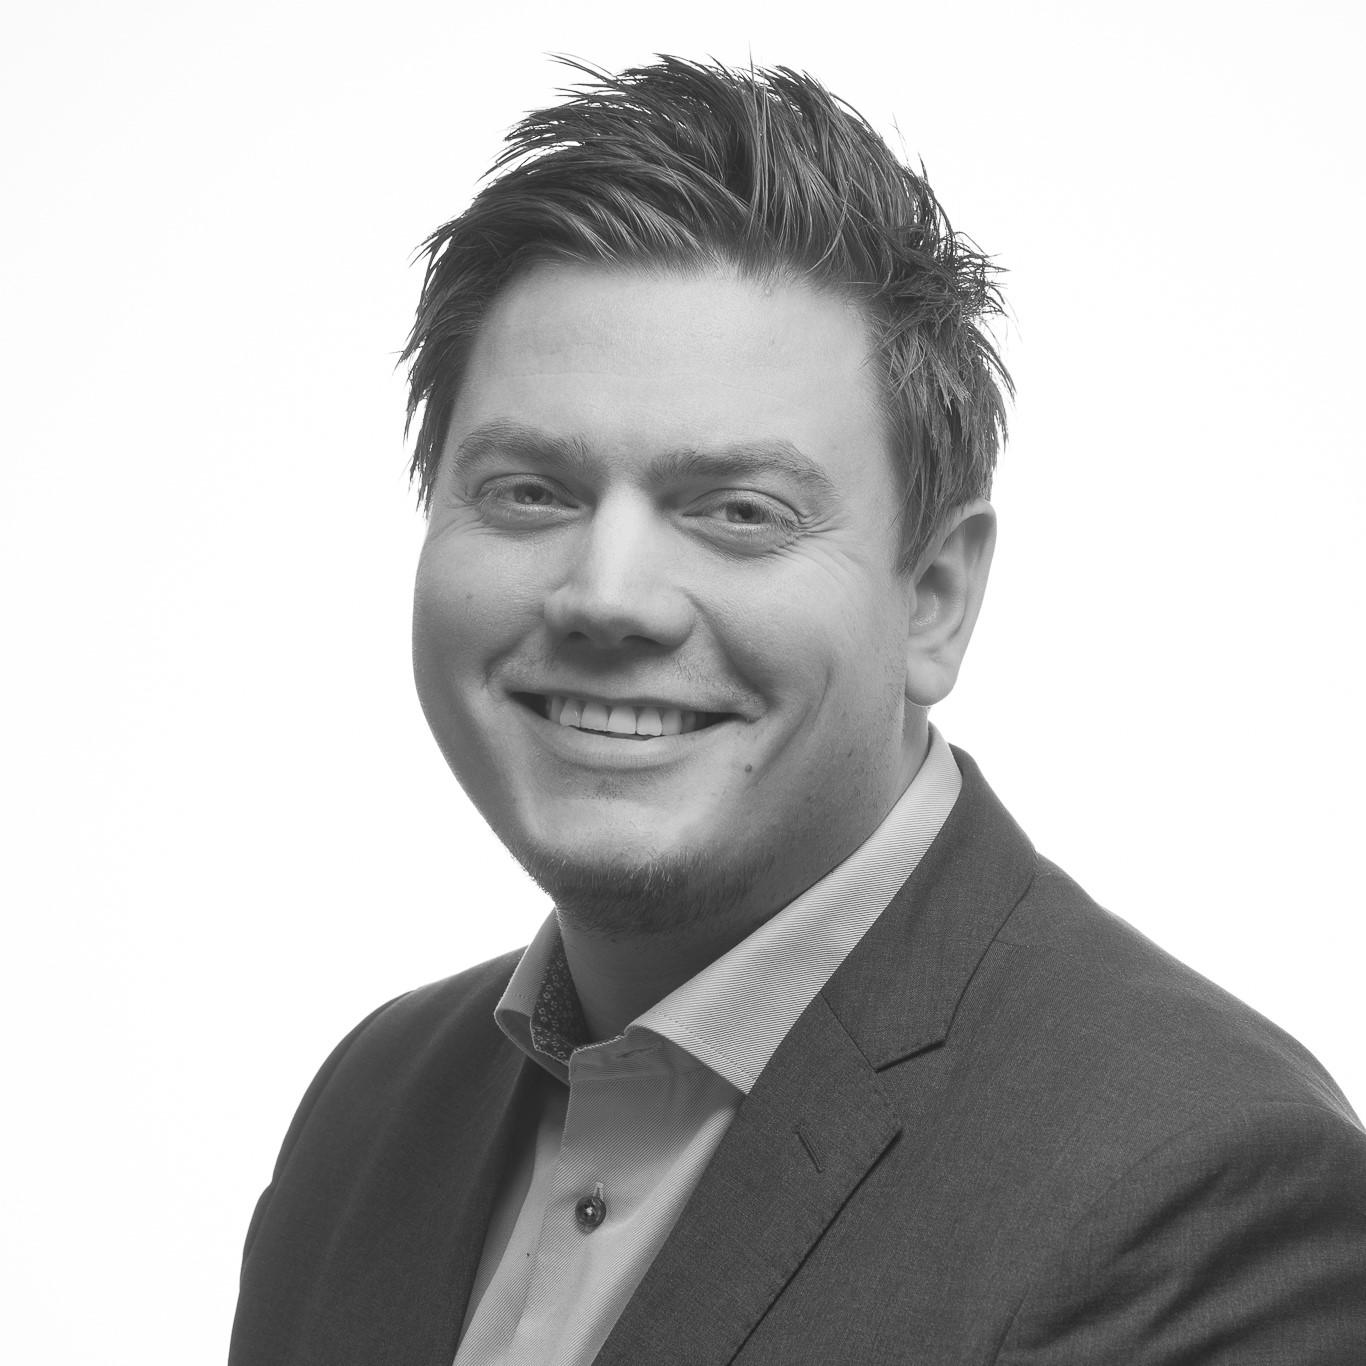 Seth - Svartvit profil